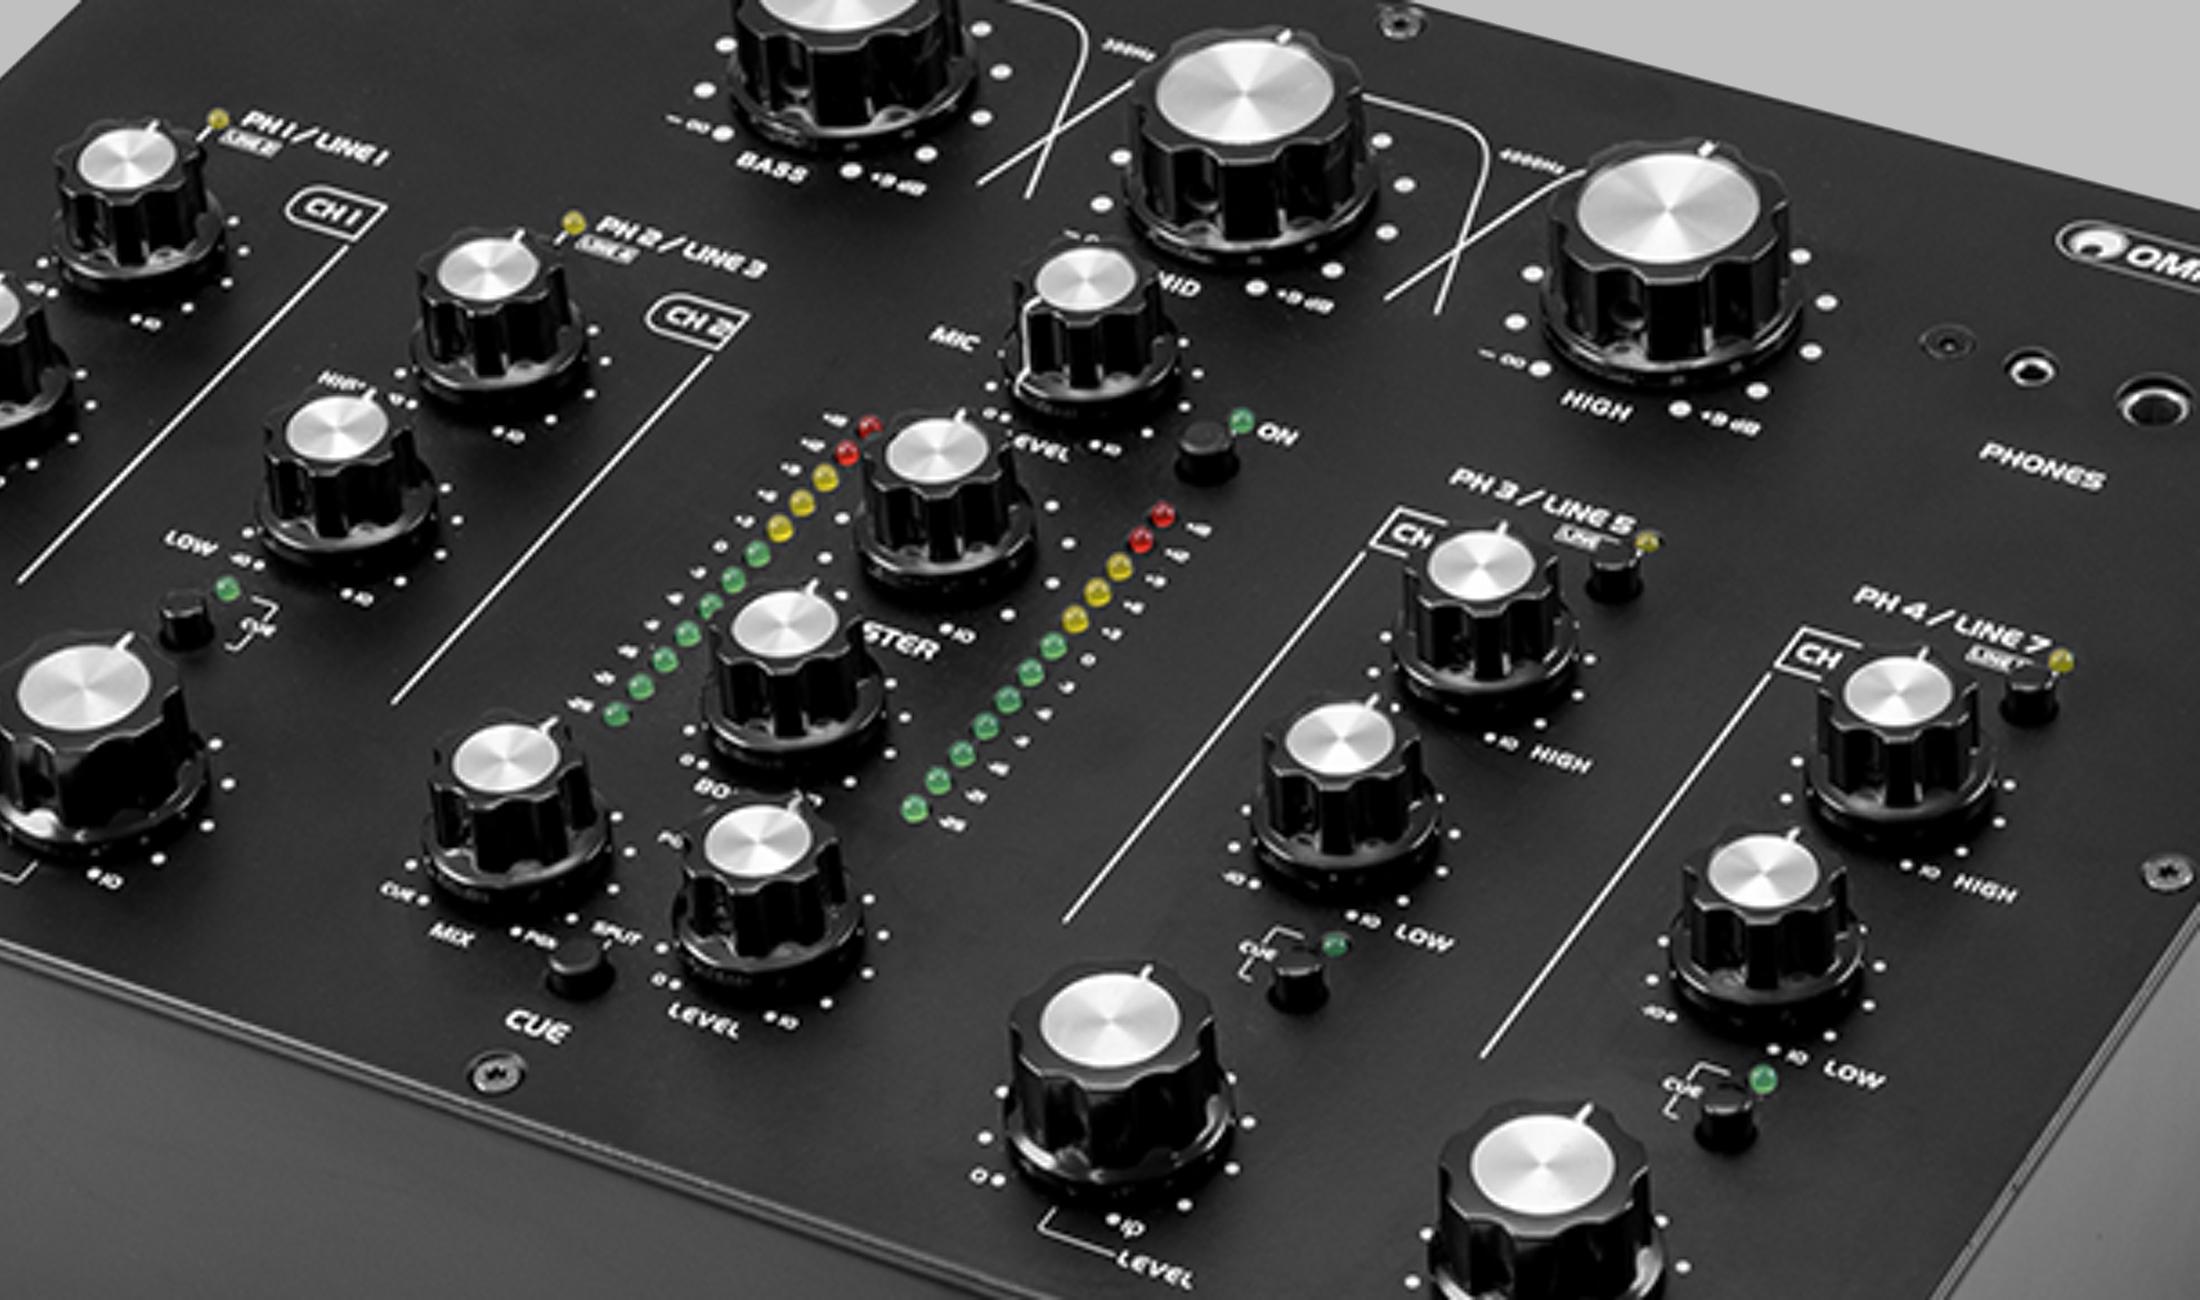 Angekündigt: Omnitronic TRM-402 – Rotary Mixer